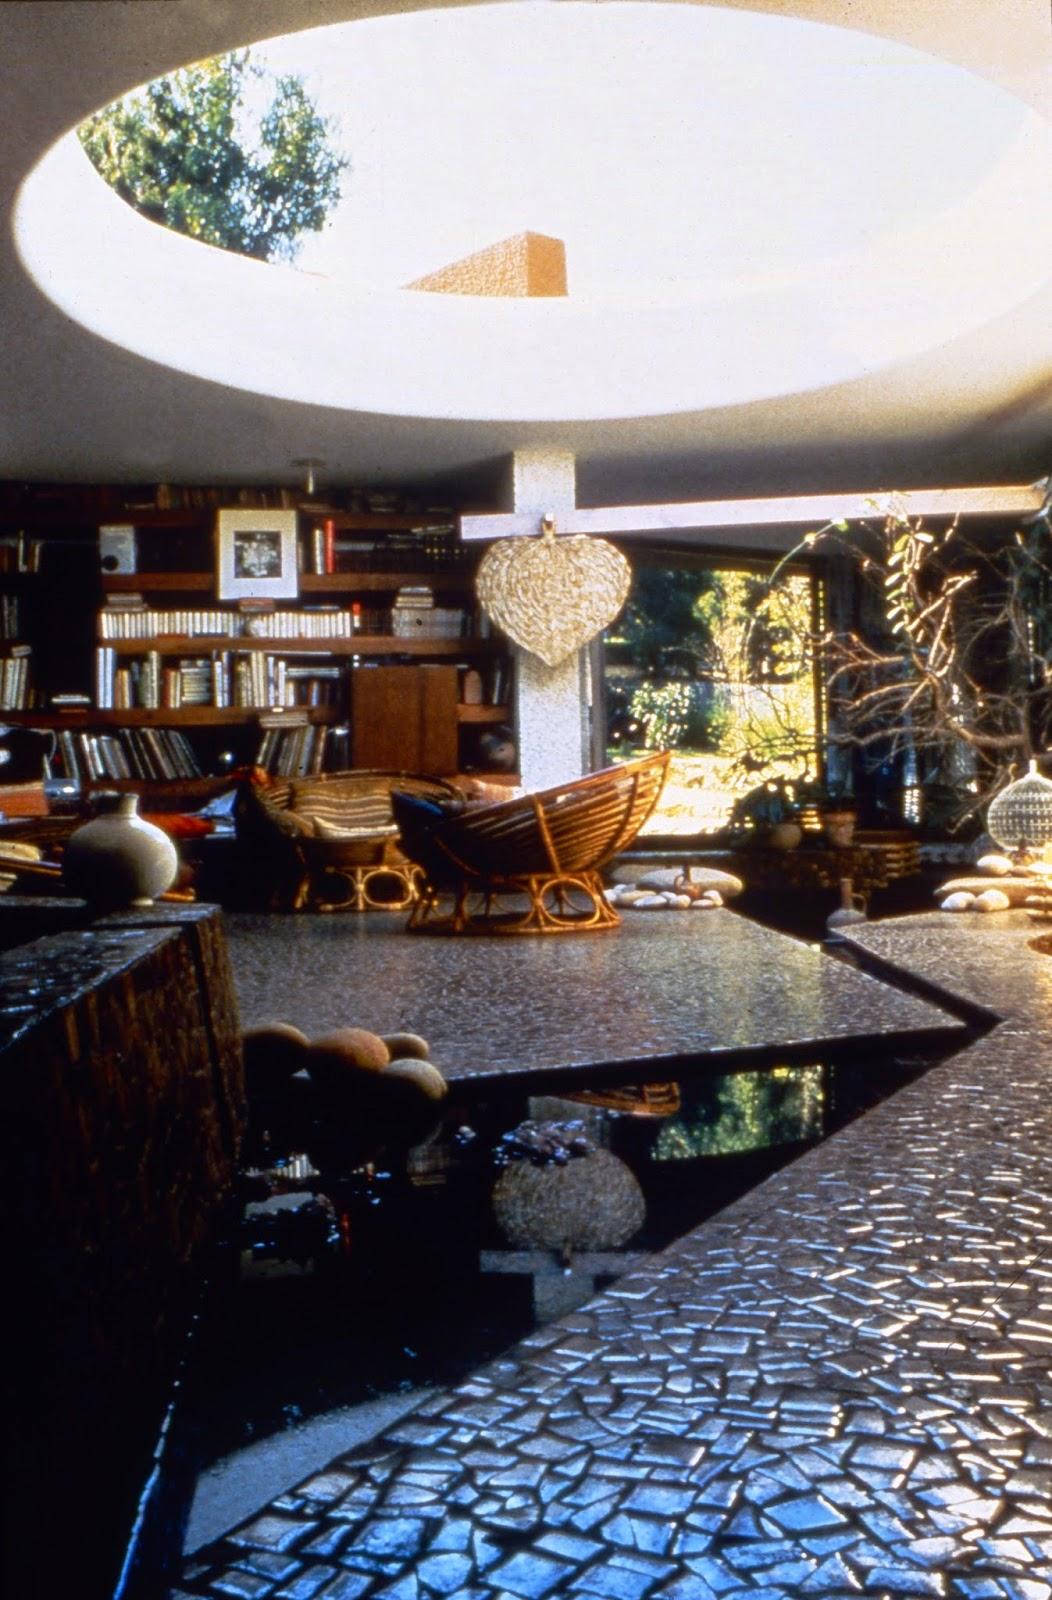 hidden architecture villa et atelier zevaco. Black Bedroom Furniture Sets. Home Design Ideas